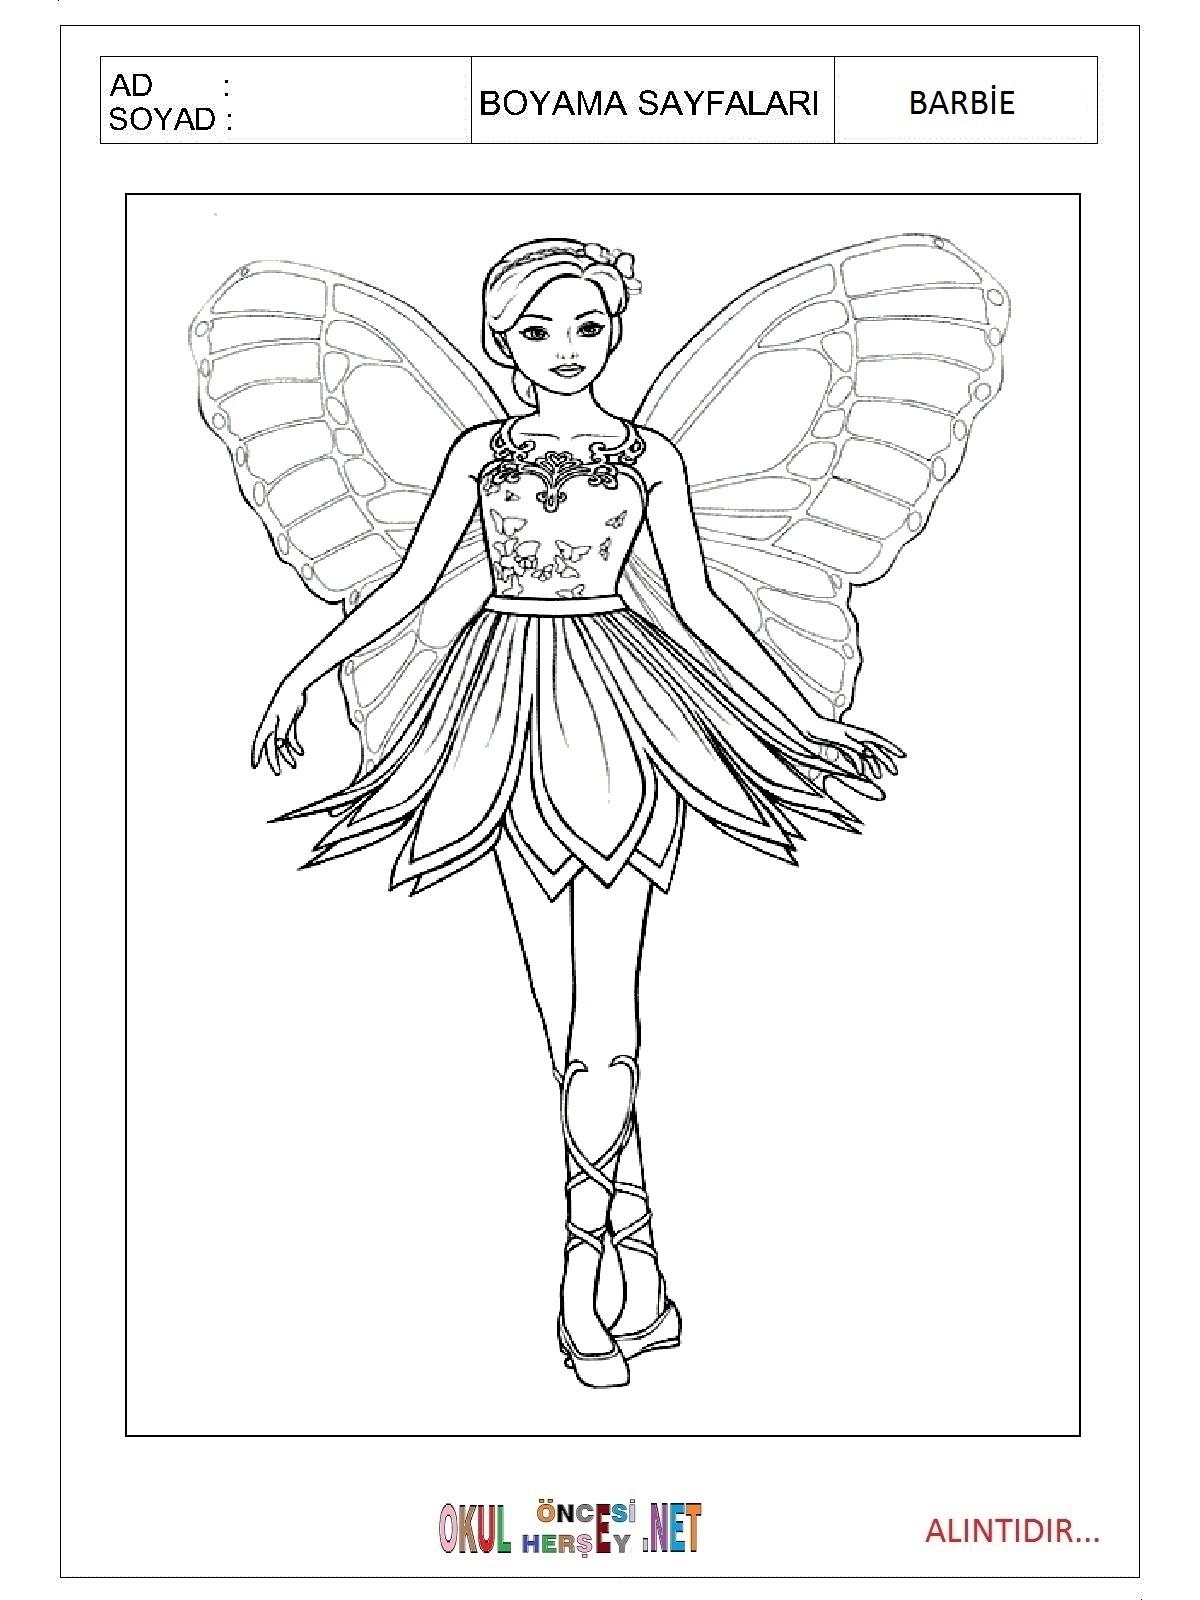 Barbie Boyama Sayfalari Indir Coloring Free To Print